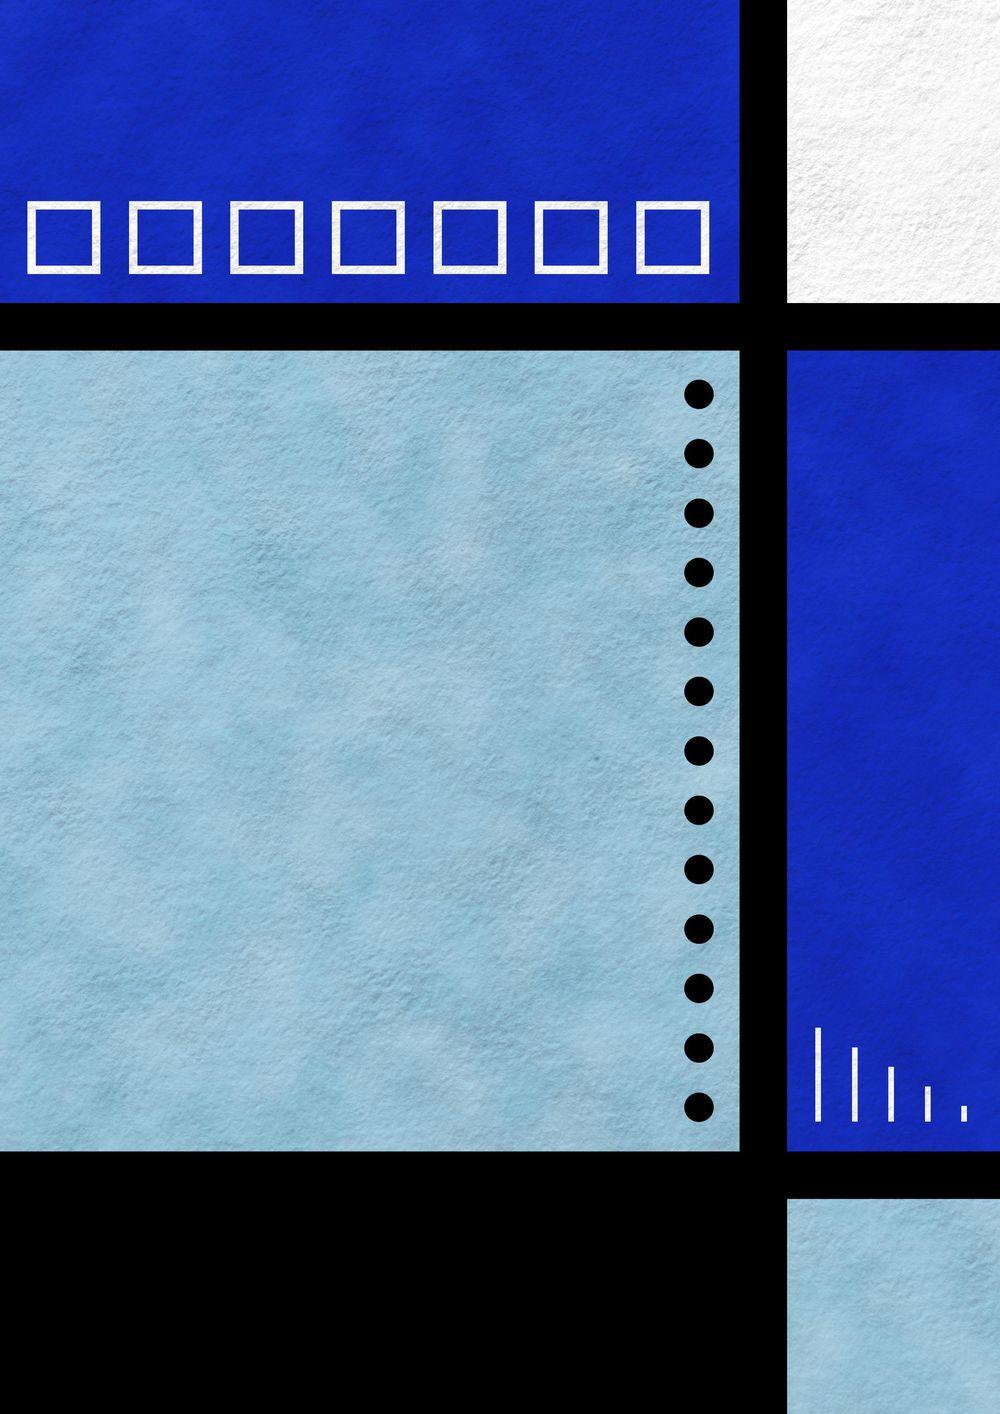 Digital Twist on Mondrian - image 1 - student project